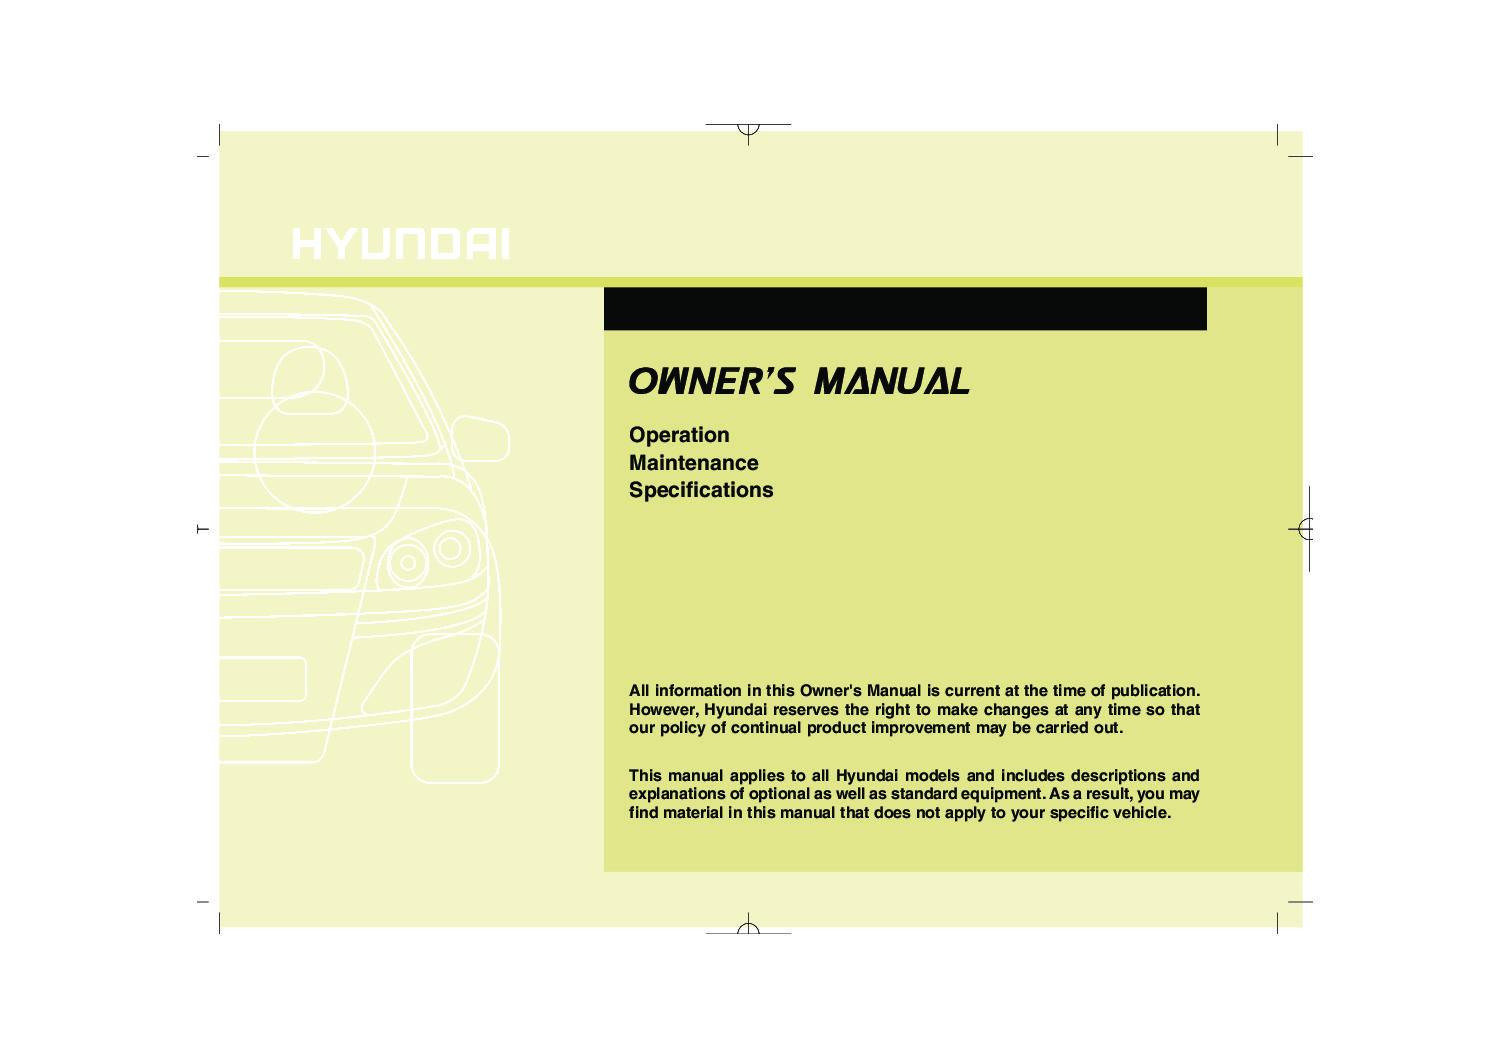 2013 hyundai sonata owners manual just give me the damn manual rh justgivemethedamnmanual com hyundai sonata owners manual 2017 hyundai sonata owners manual 2016